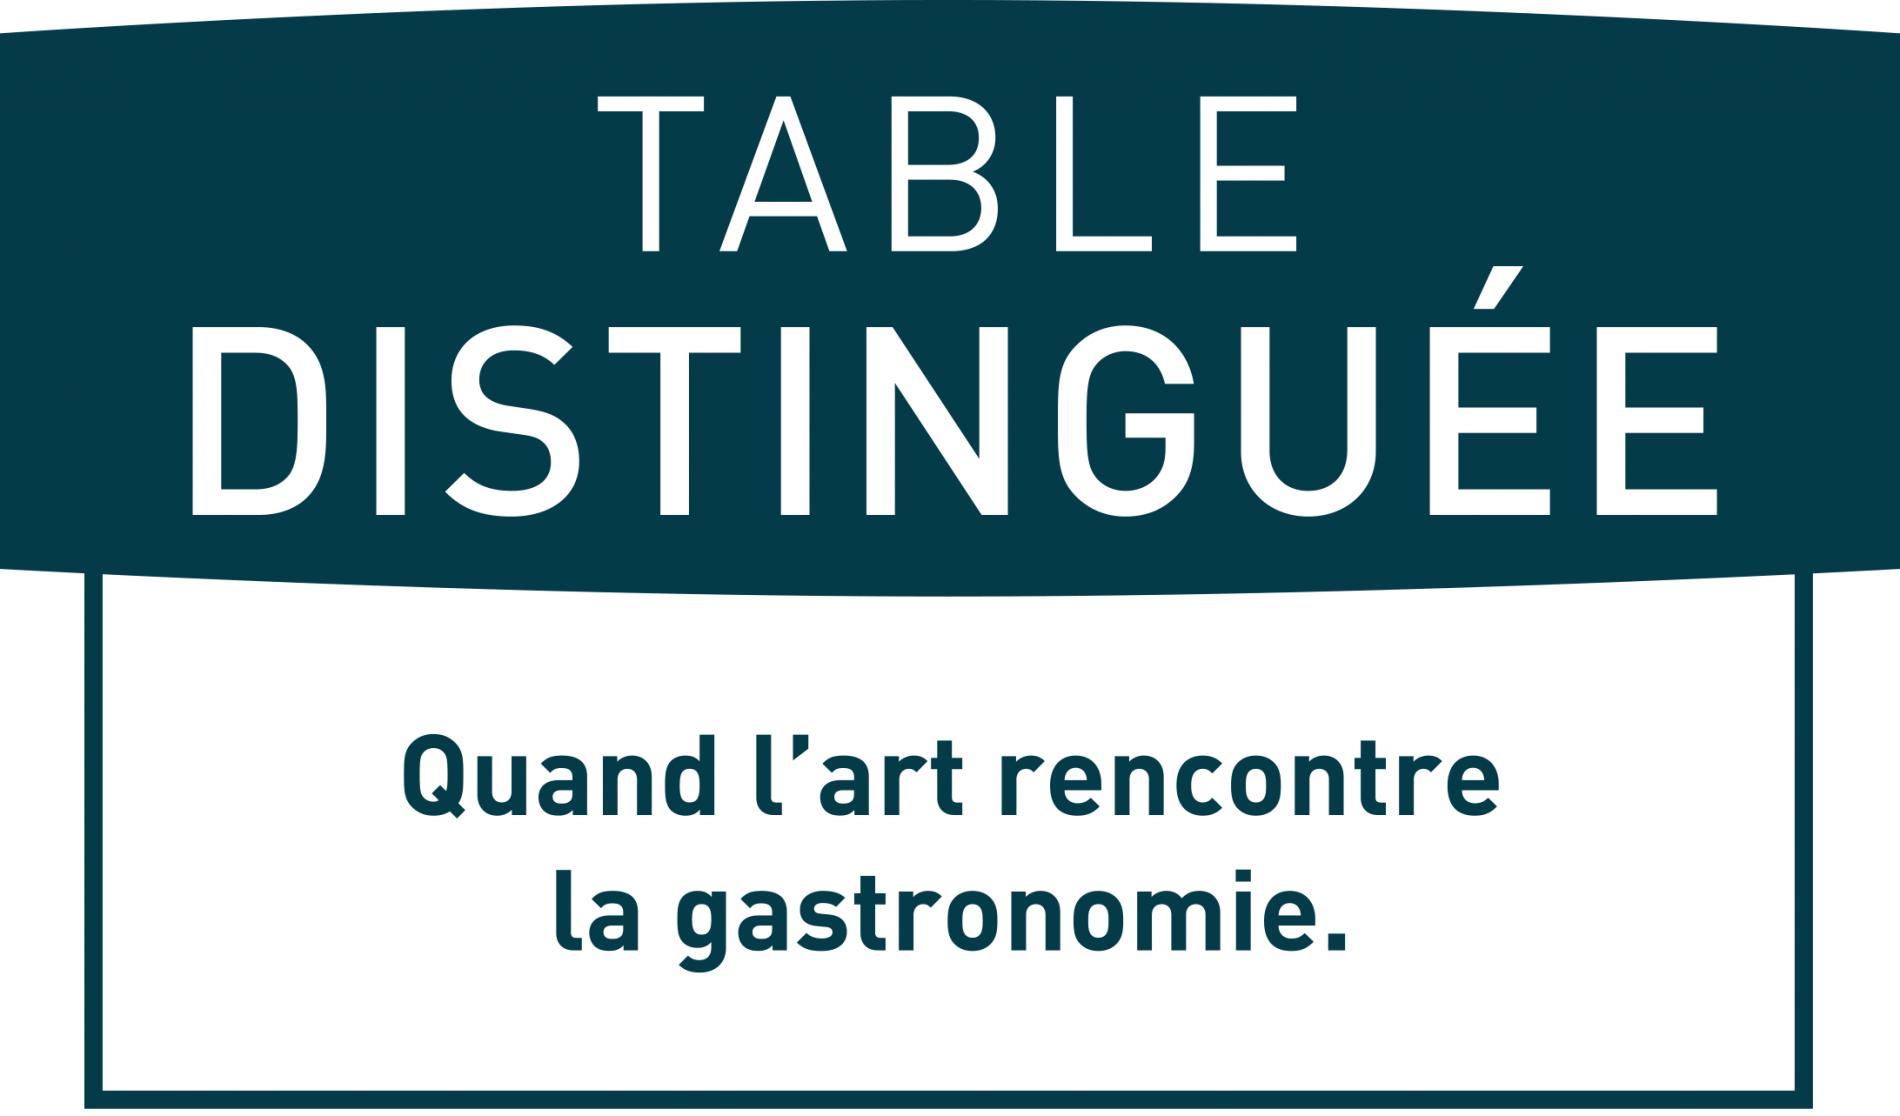 Logis Table distinguée Restaurant proche La Roche Posay